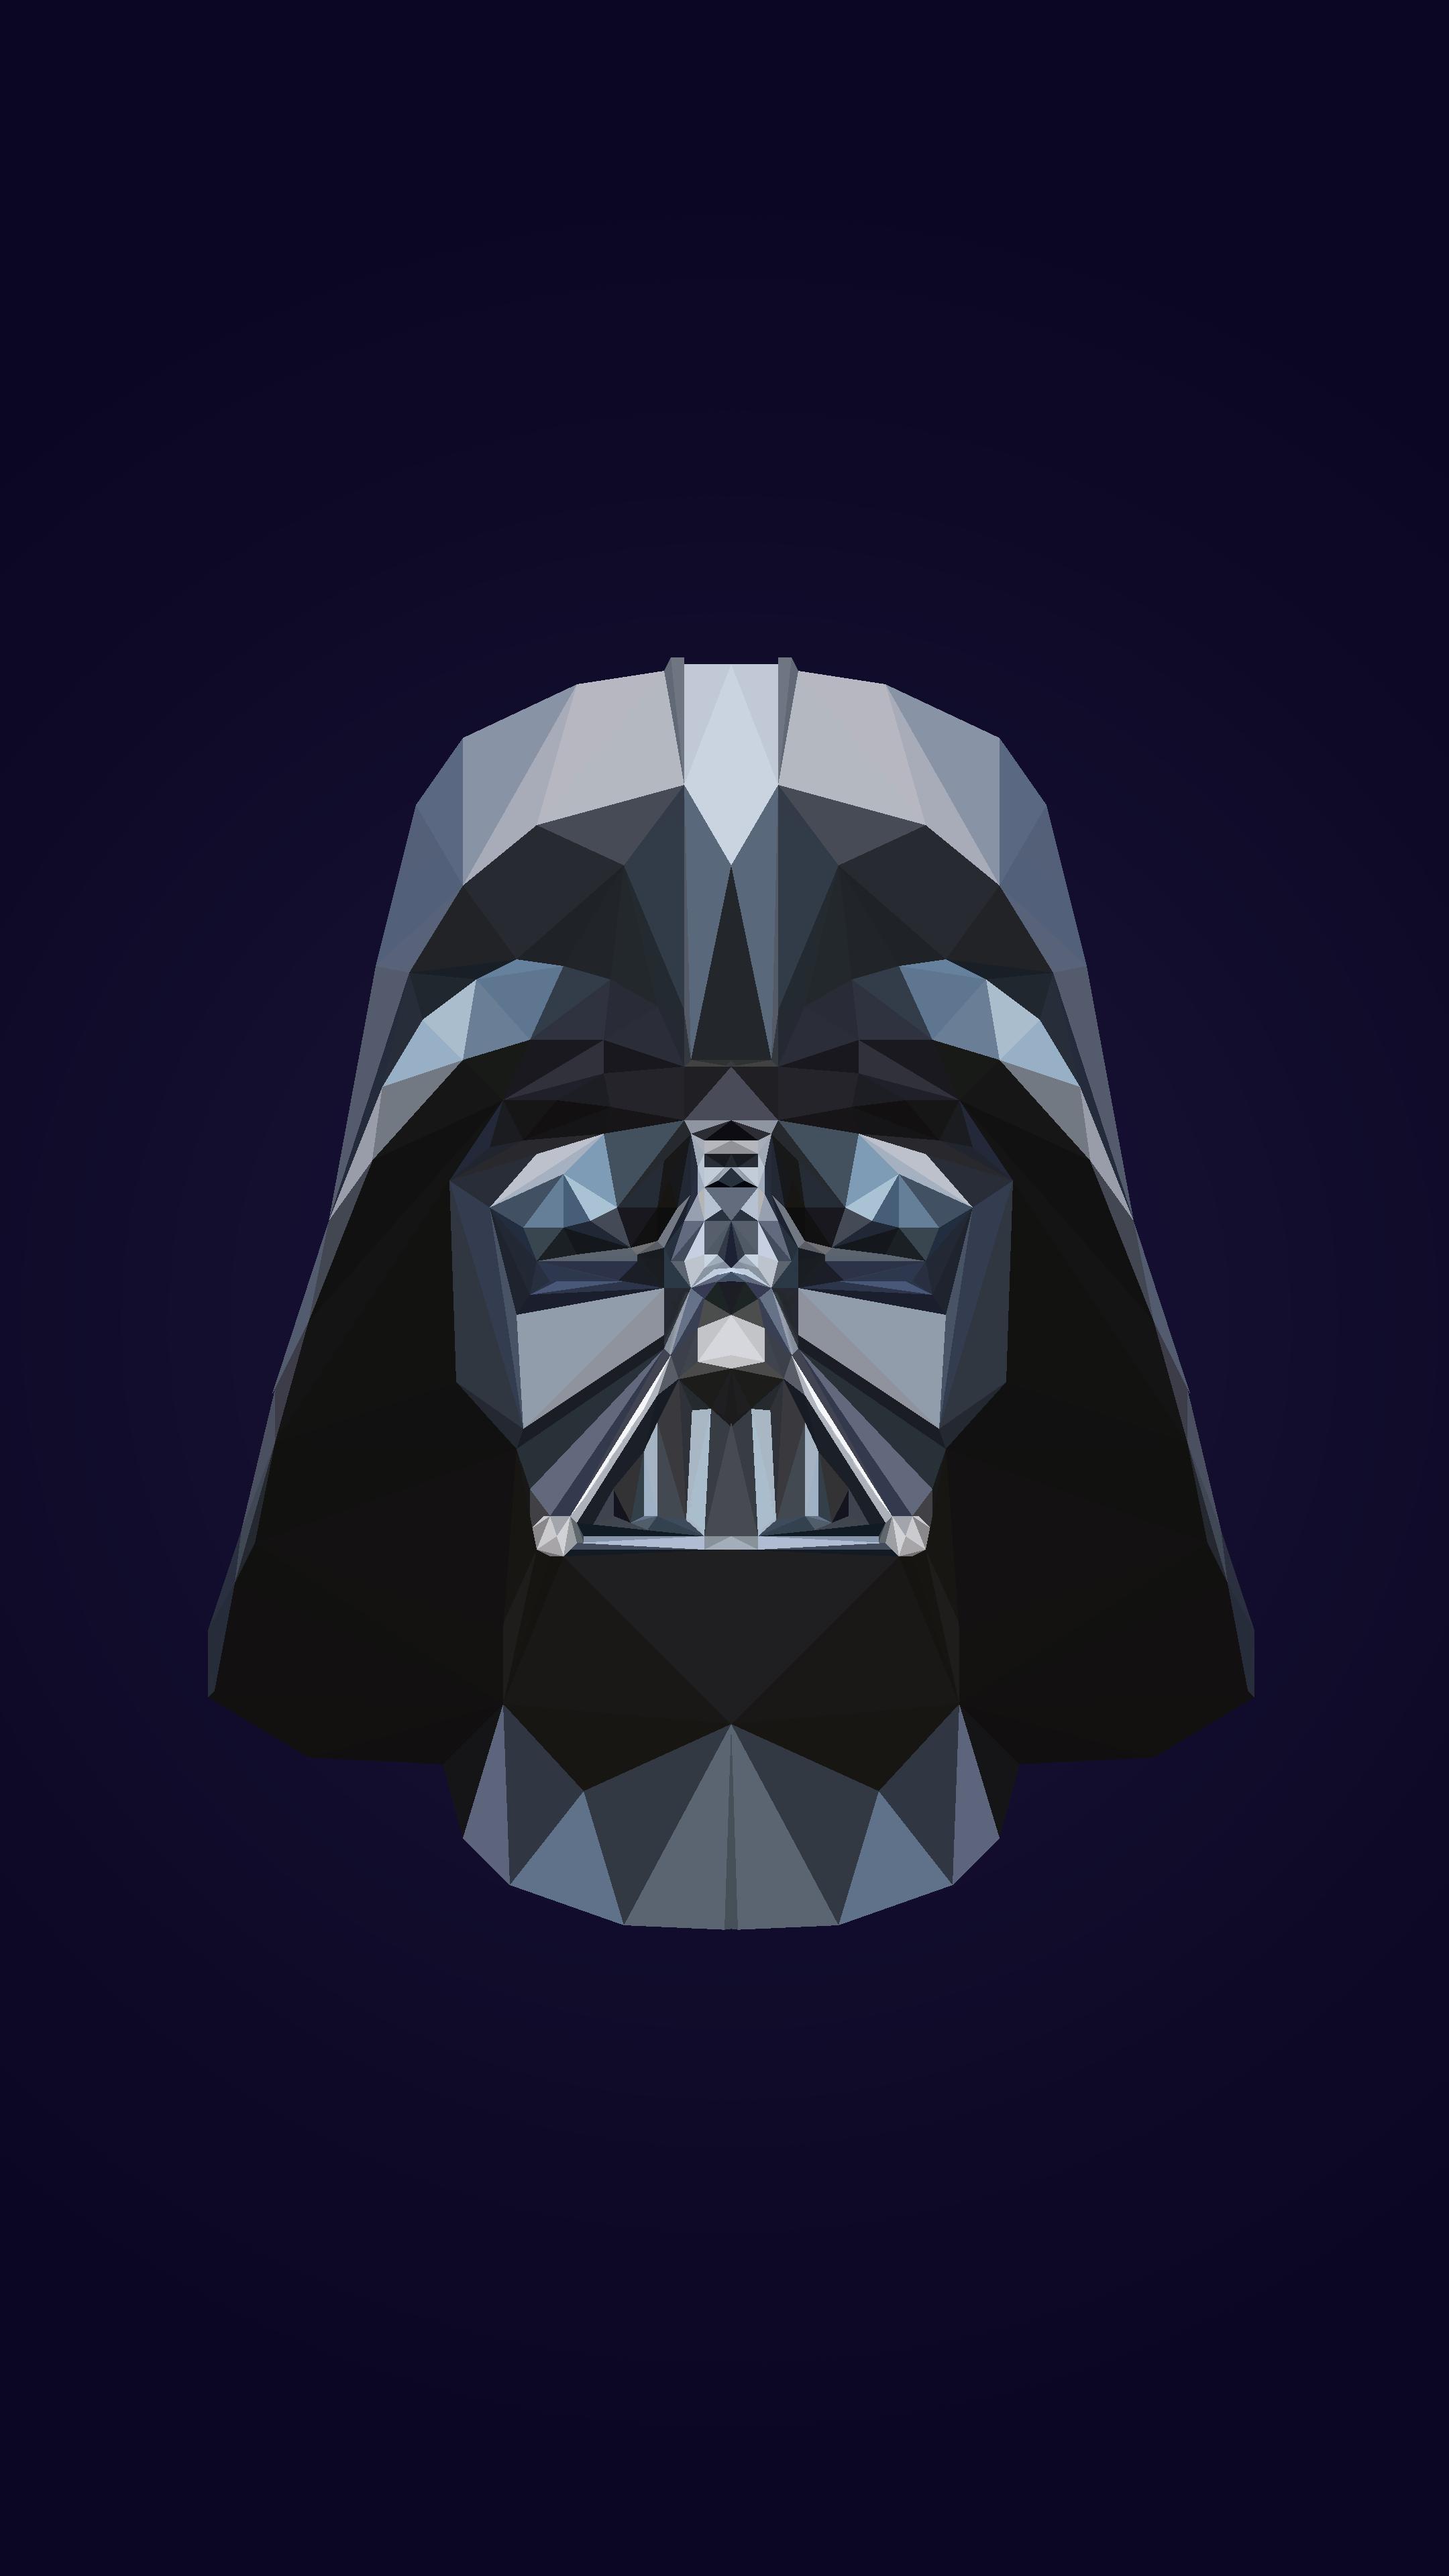 Darth Vader 4k Phone Wallpapers Wallpaper Cave